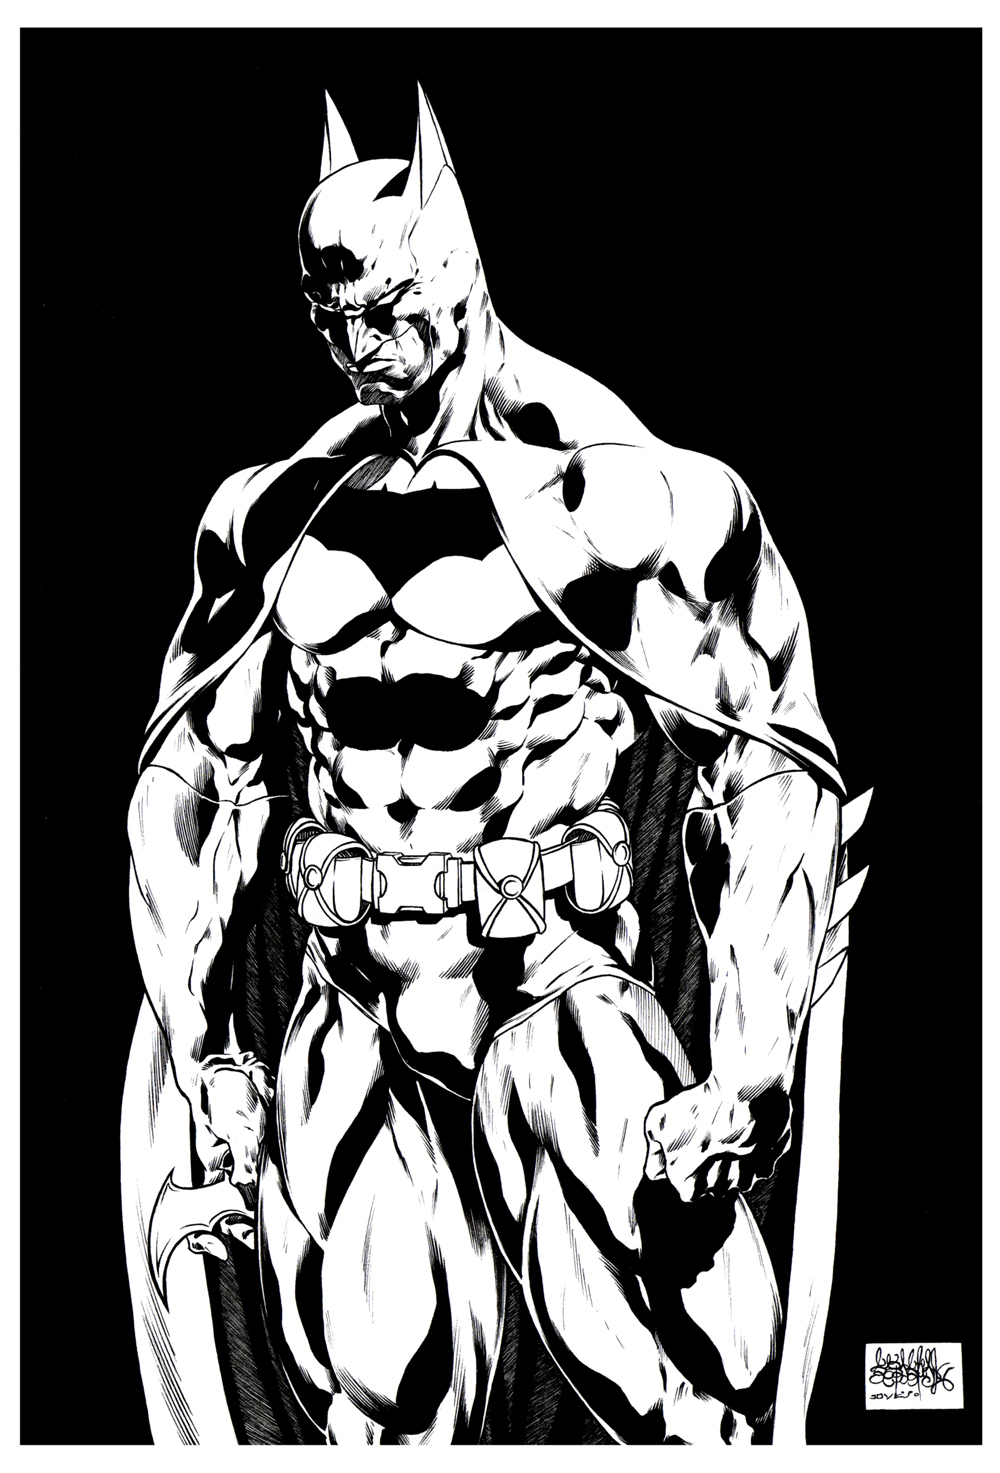 batman_by_garnabiuth-d5en6ci.jpg